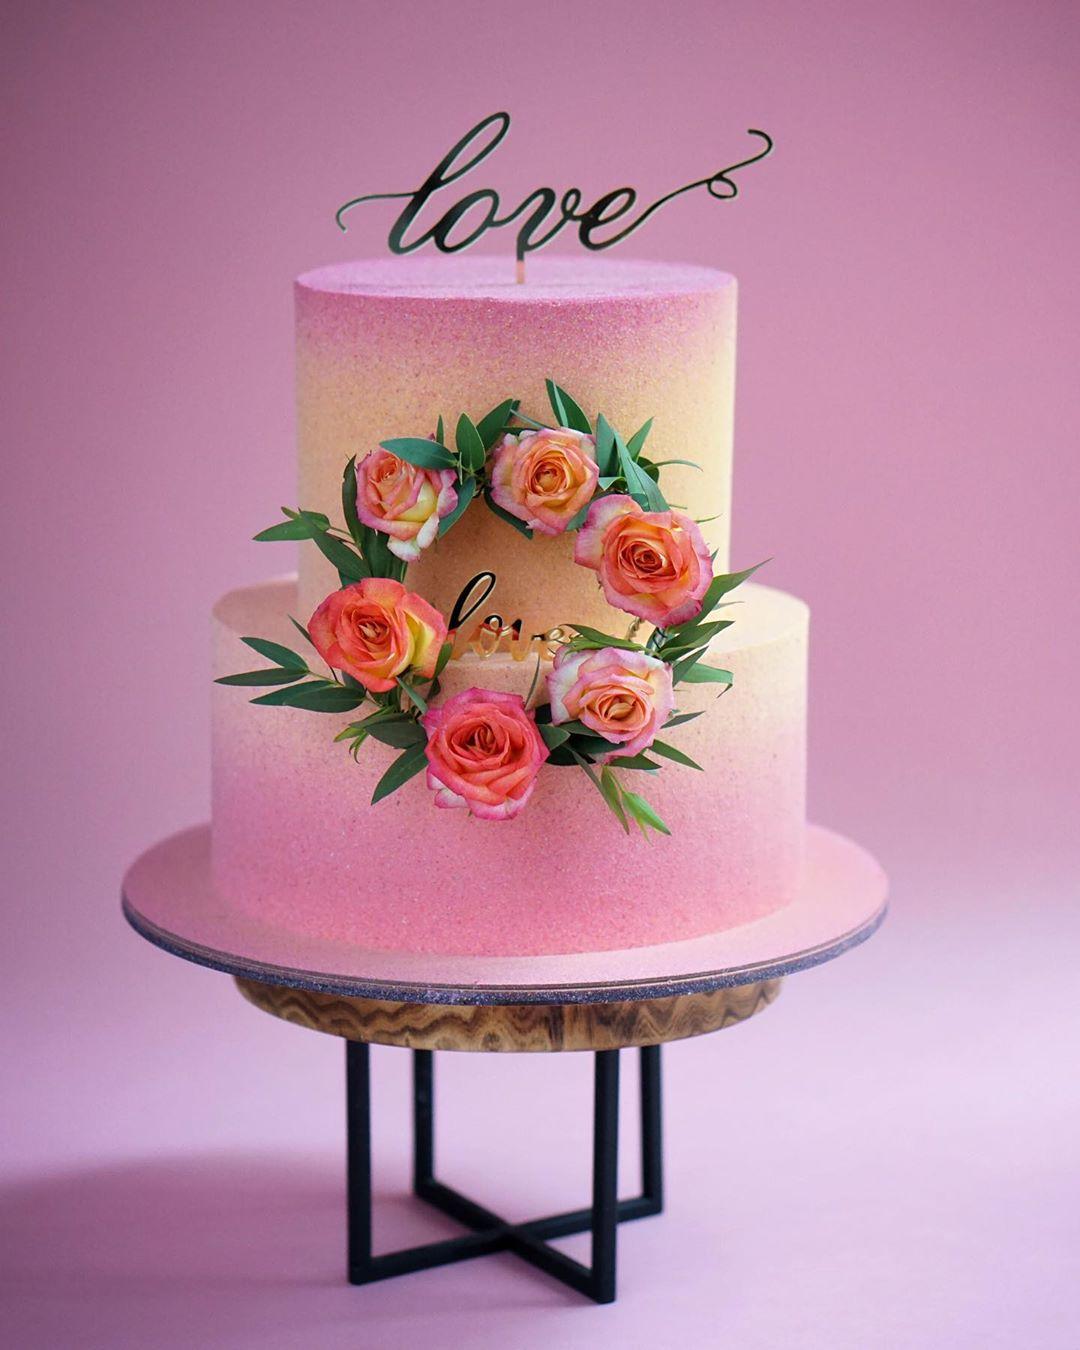 Laser Cut Love Cake Topper Free Vector